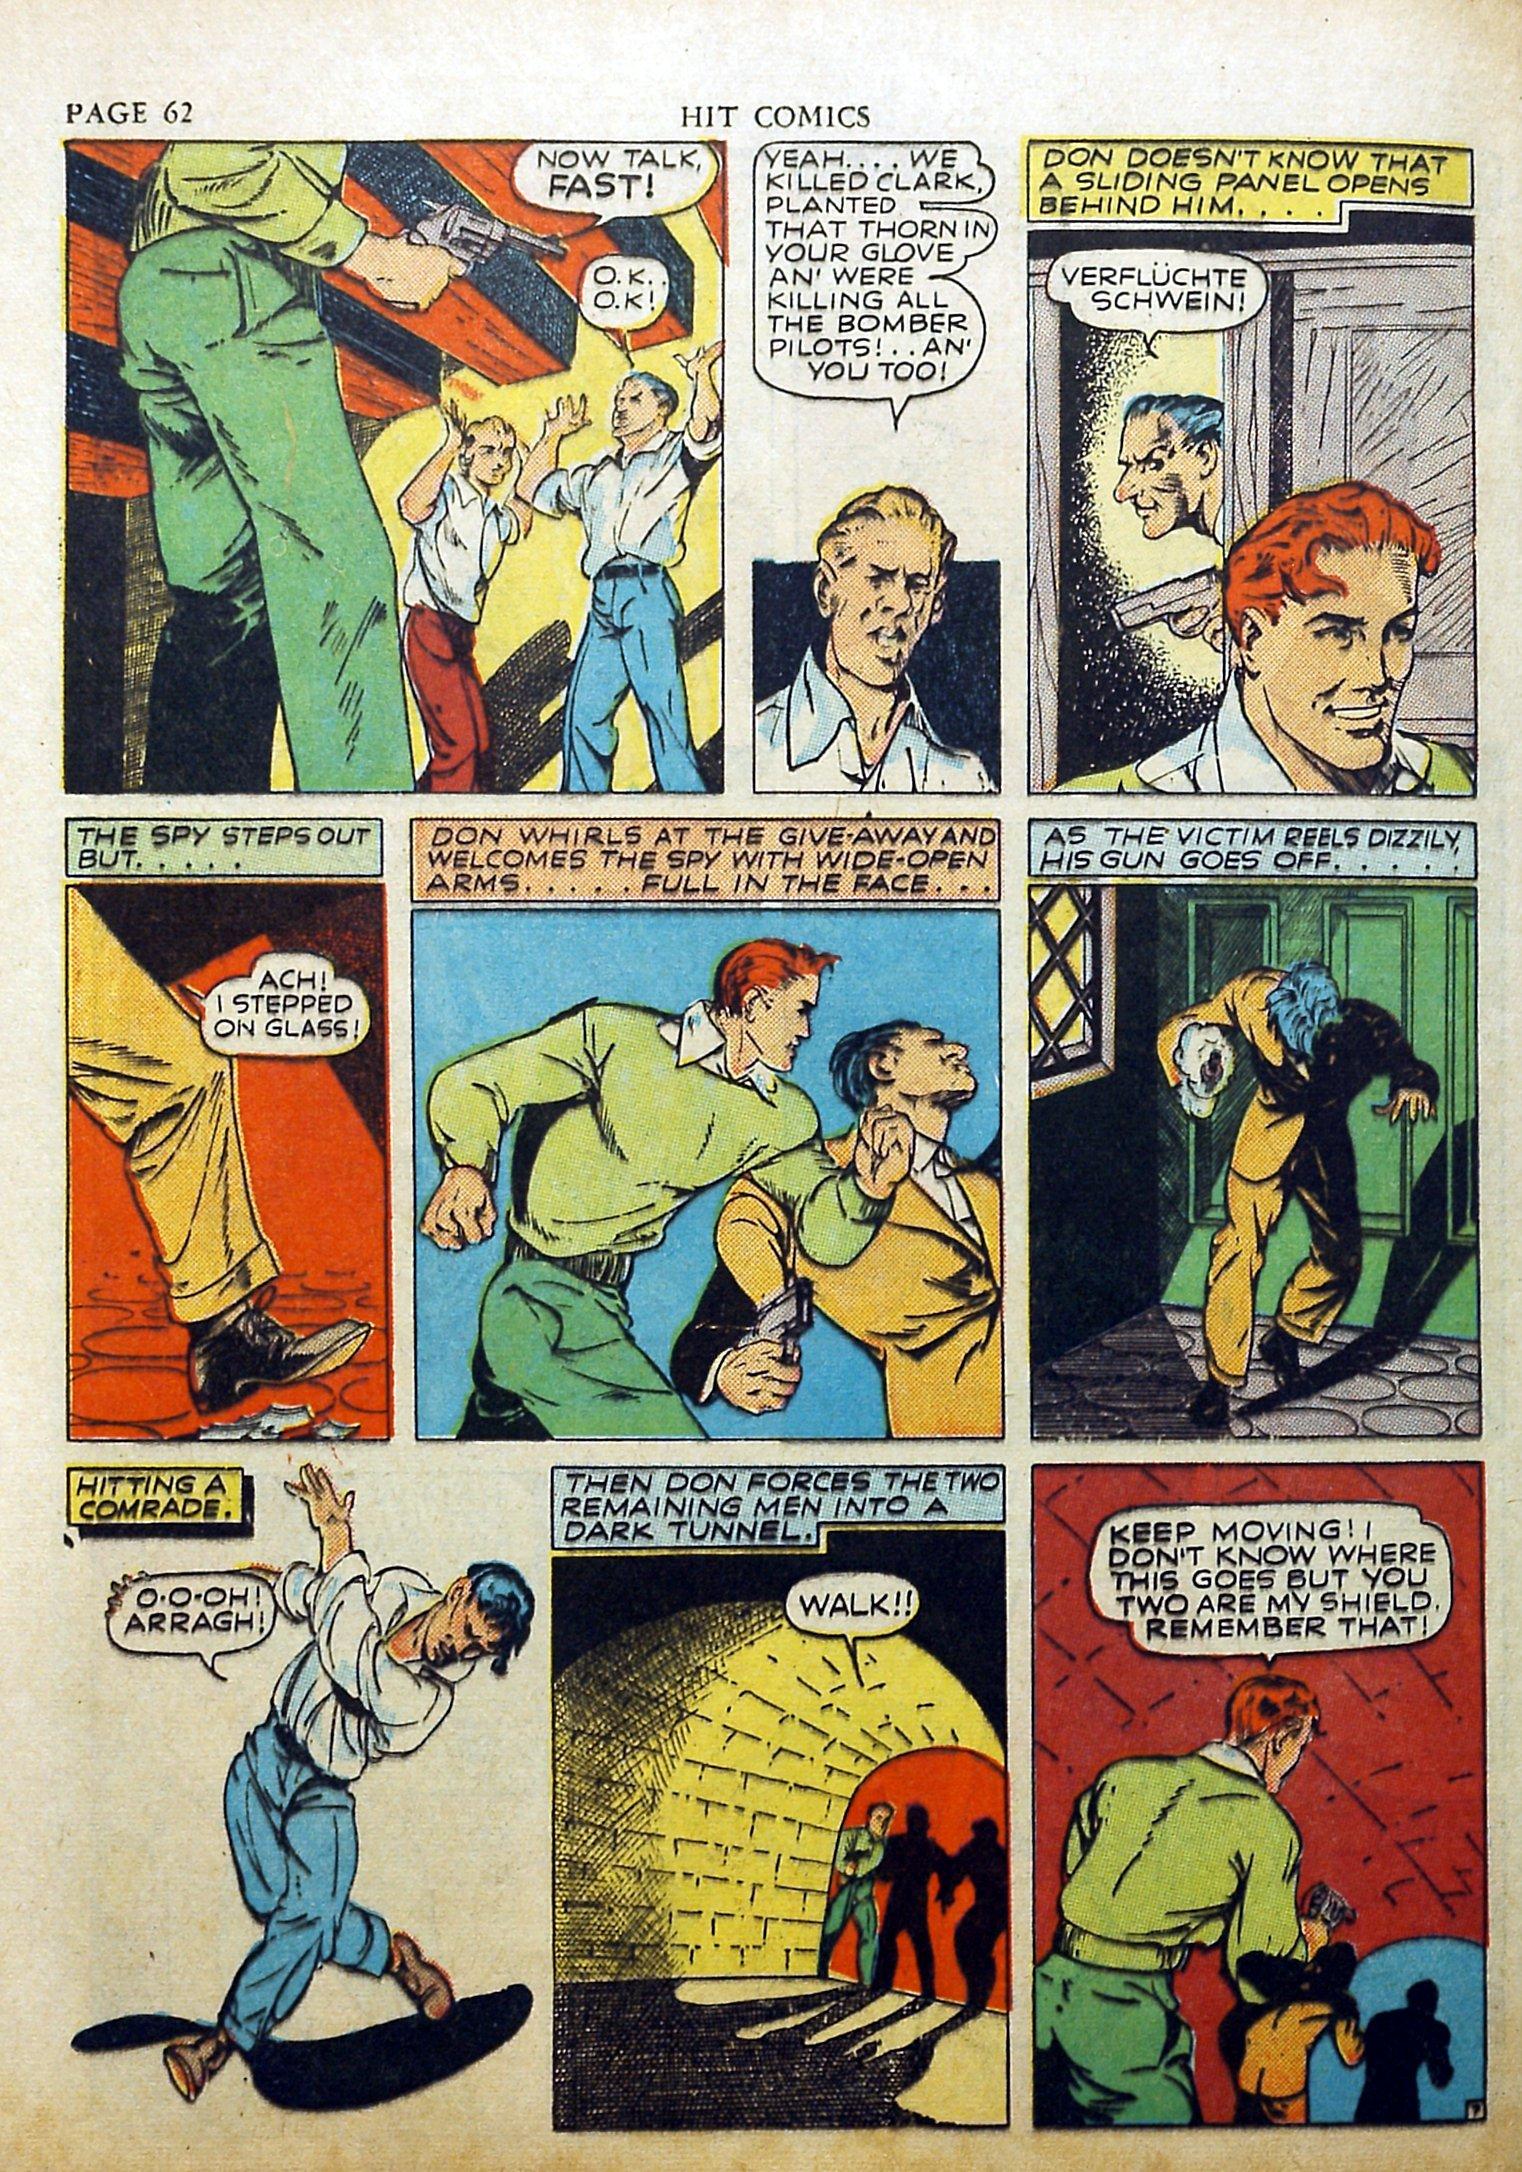 Read online Hit Comics comic -  Issue #17 - 64